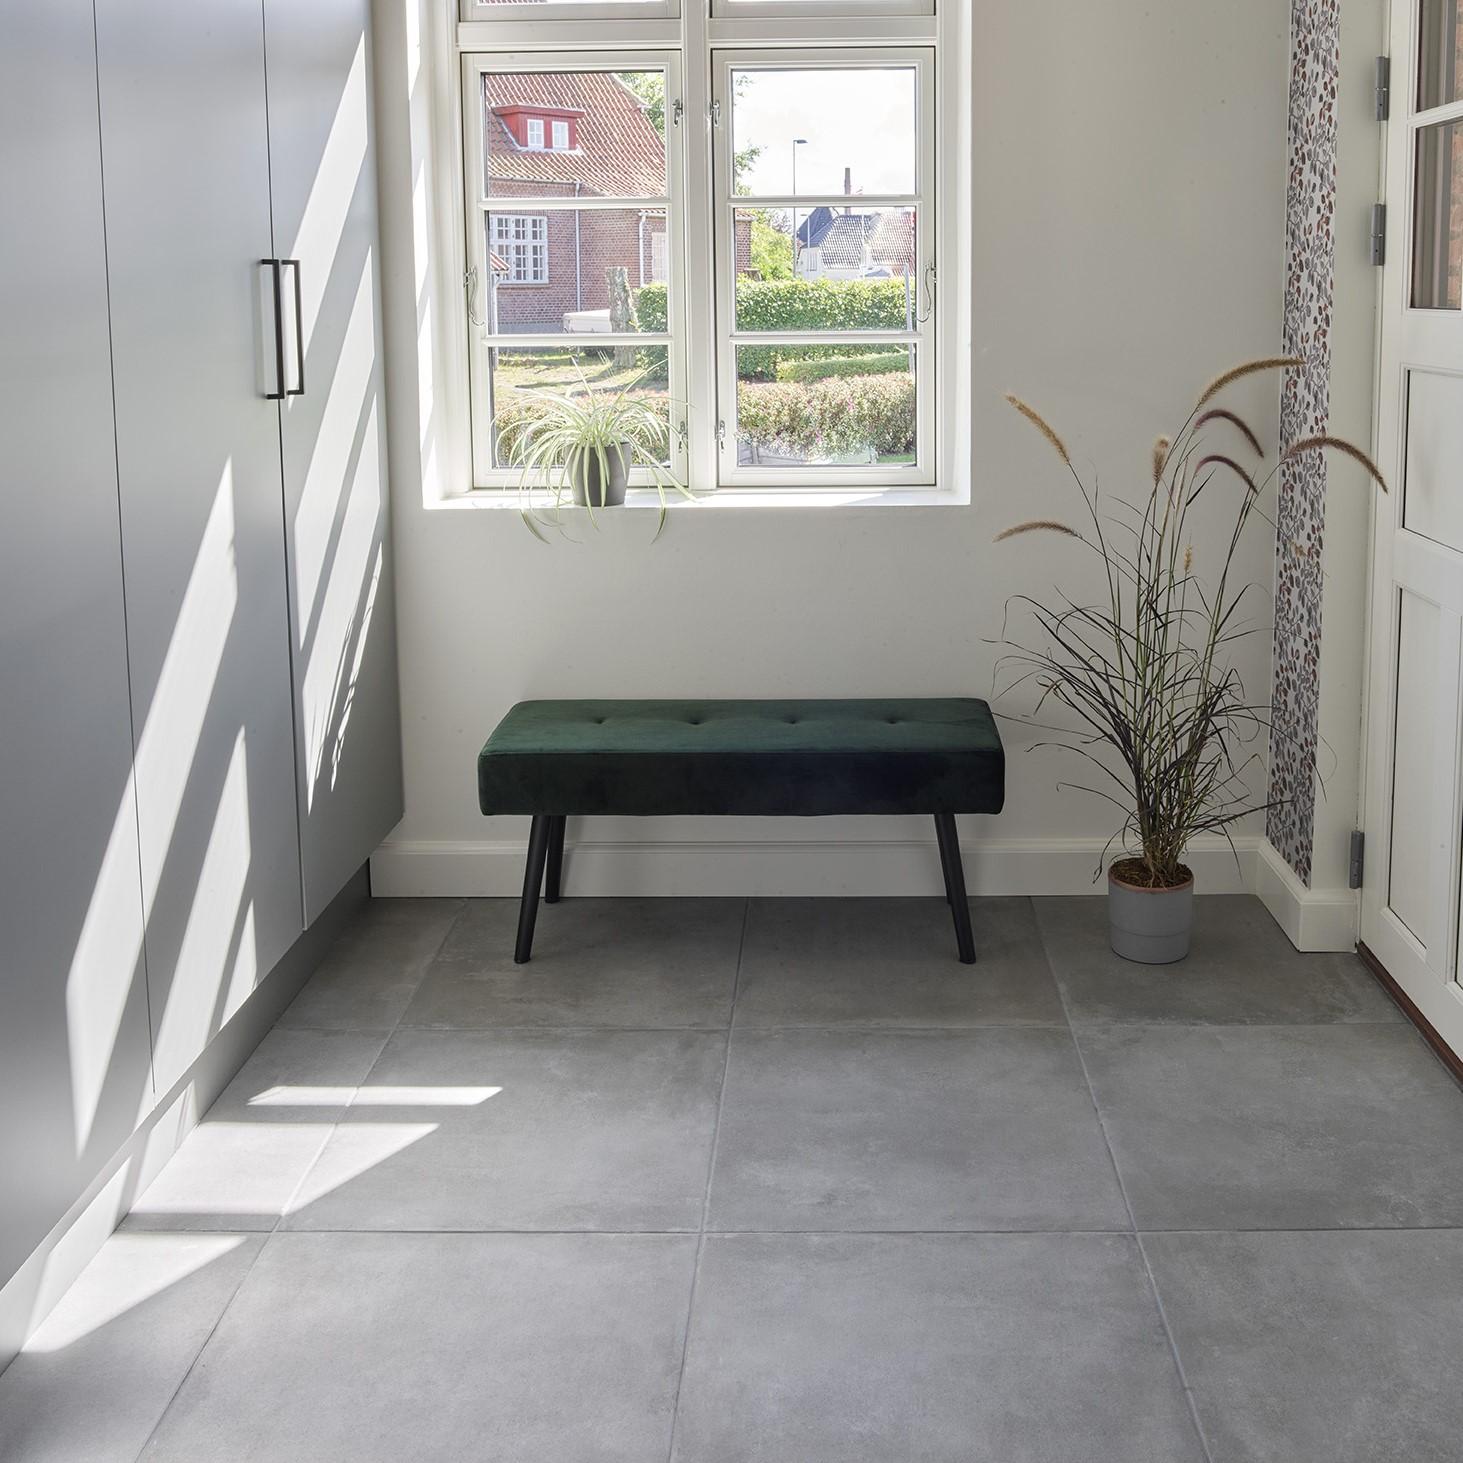 Picture of: 90 X 90 Gulvklinke Med Beton Look Super Flot Top Kvalitet